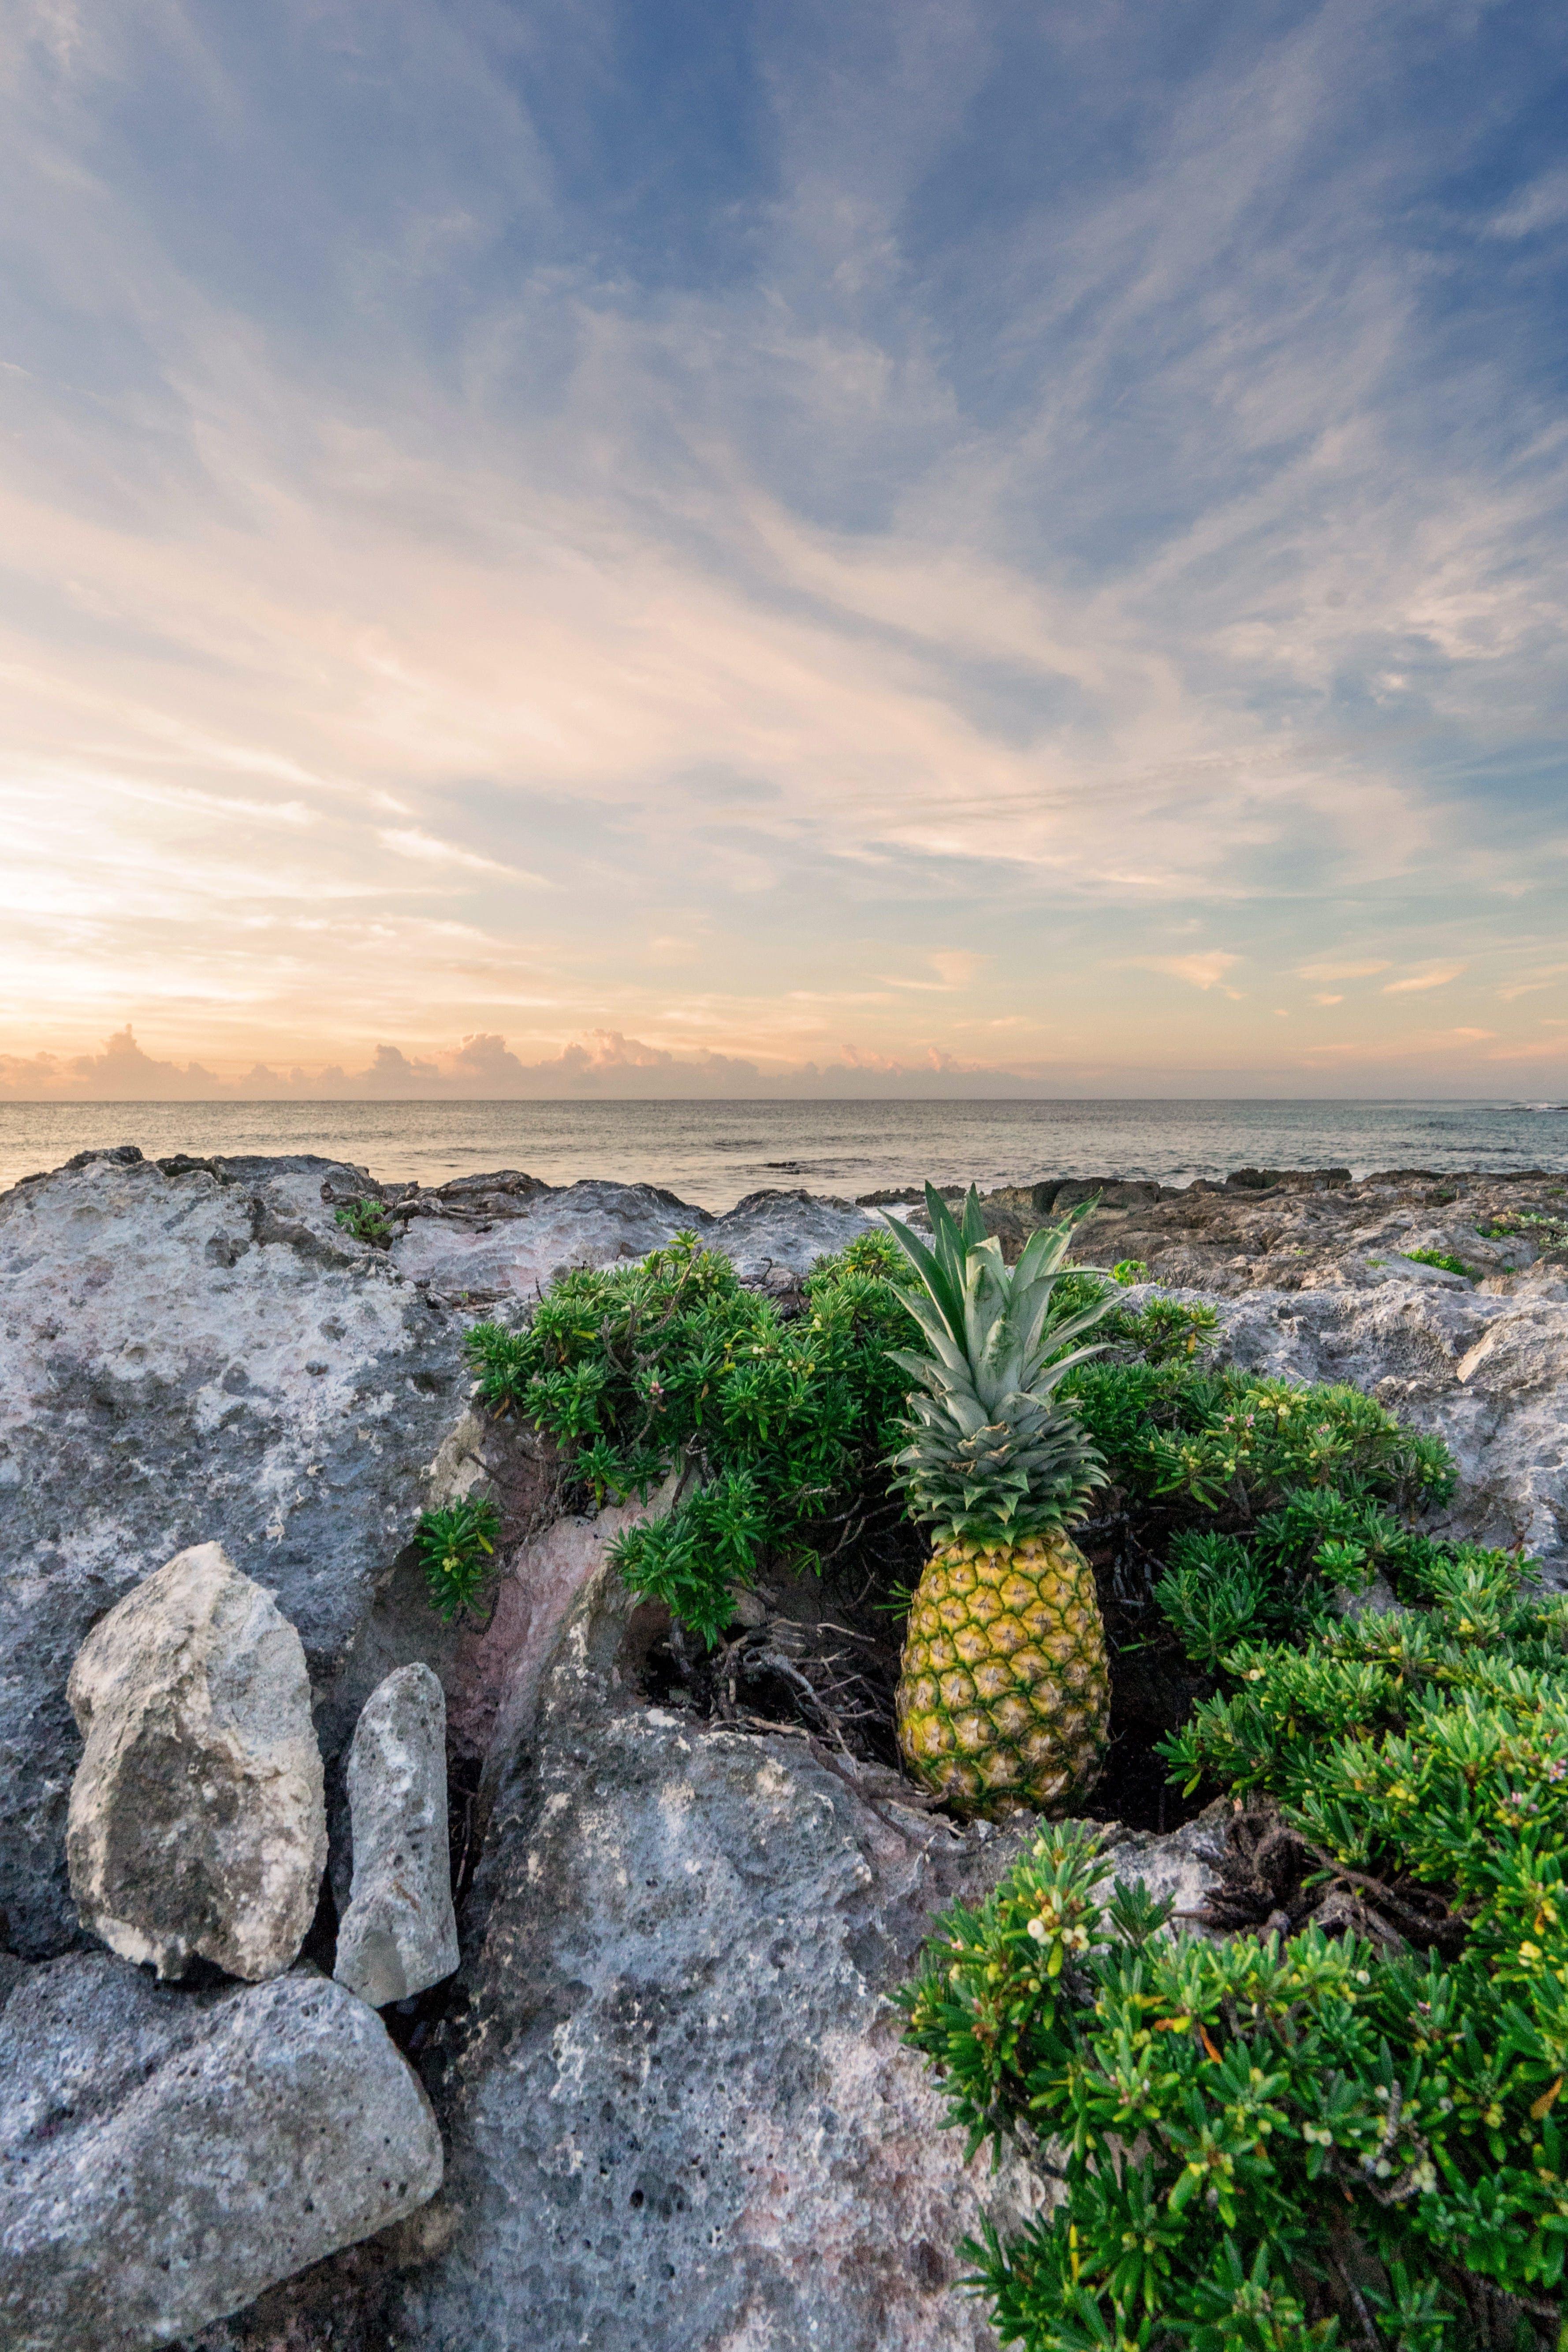 Pineapple Fruit on Rock